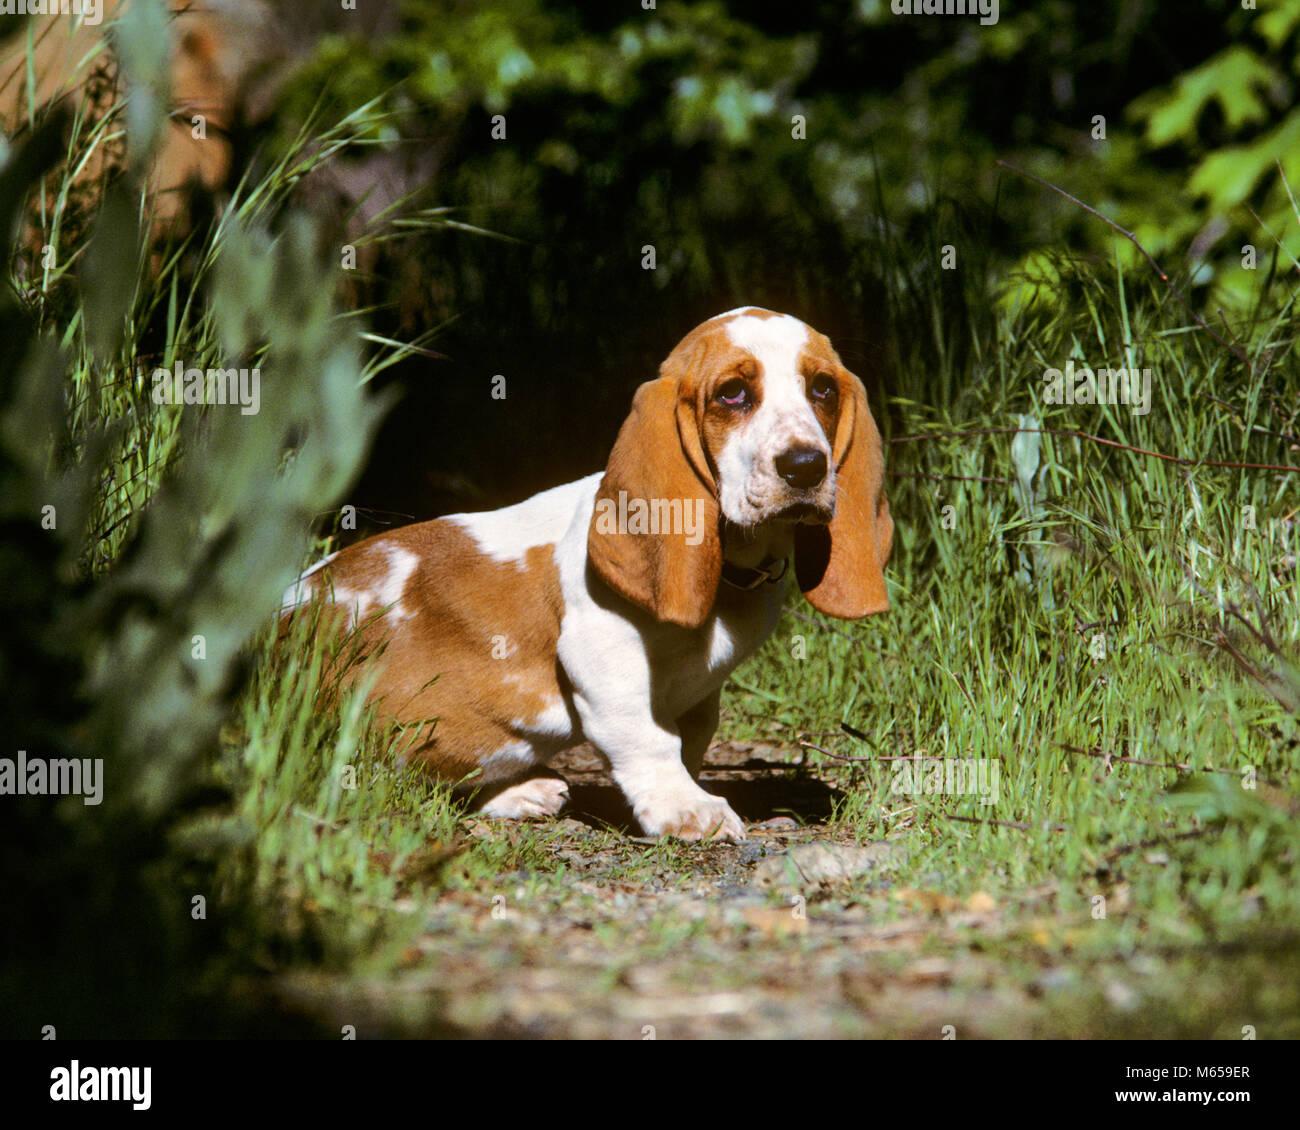 Most Inspiring Floppy Ears Brown Adorable Dog - basset-hound-puppy-in-a-garden-kd5166-wal003-hars-animals-dog-basset-M659ER  You Should Have_527455  .jpg